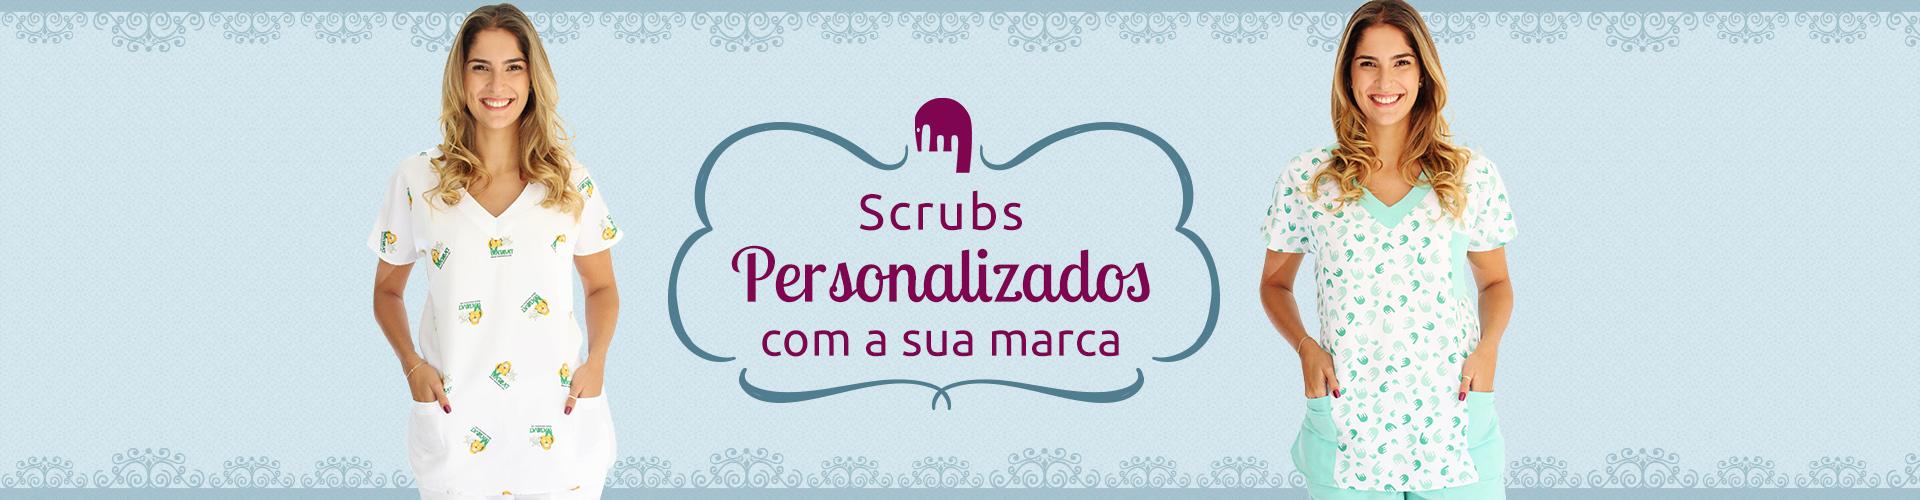 scrubs-personalizados